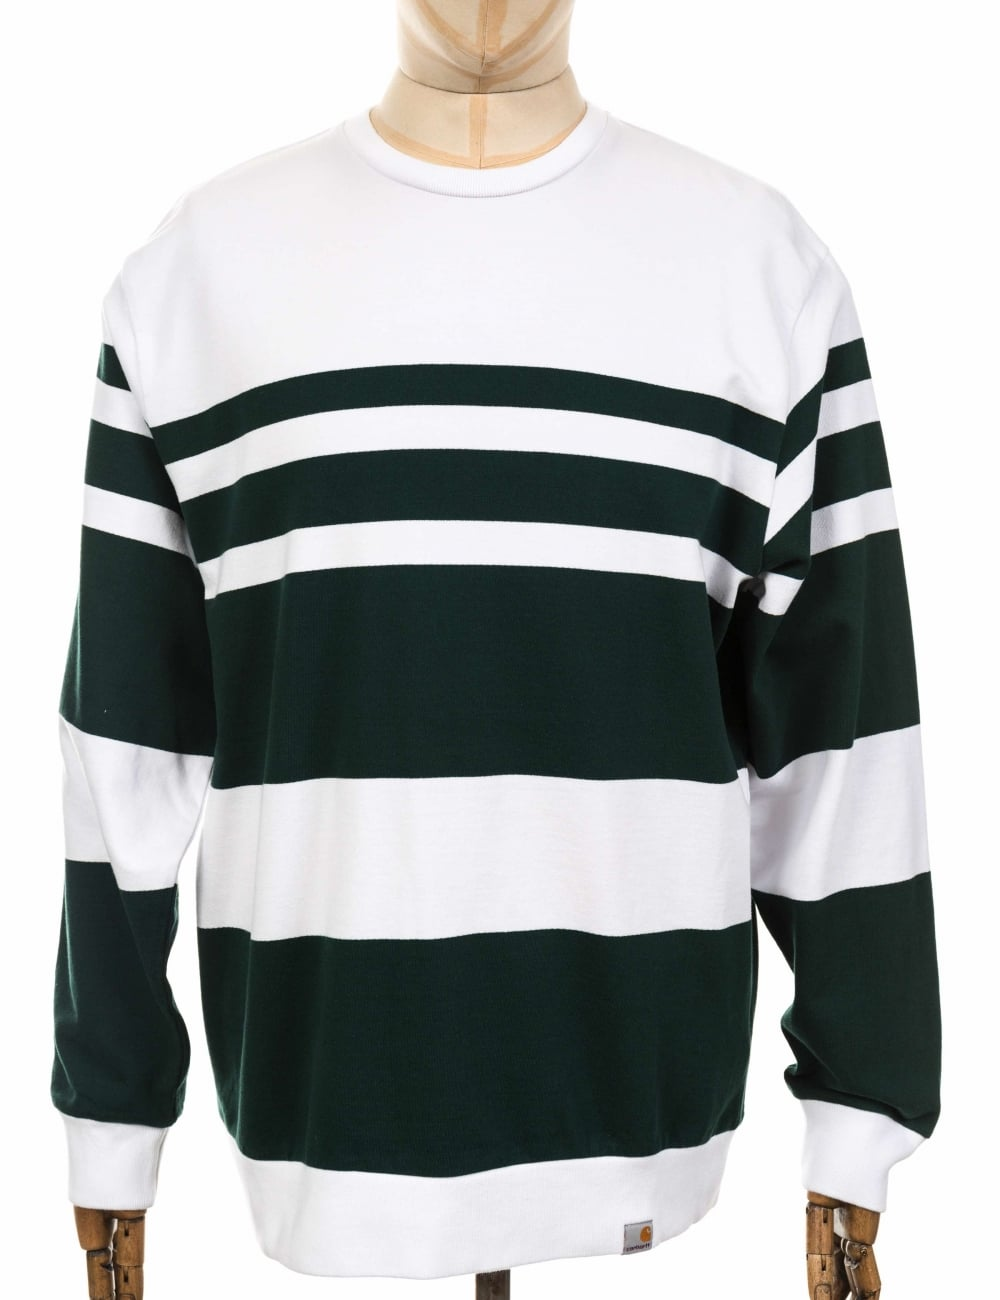 0994eb9c789 Carhartt WIP Orlando Sweatshirt - White Tasmania - Clothing from Fat ...